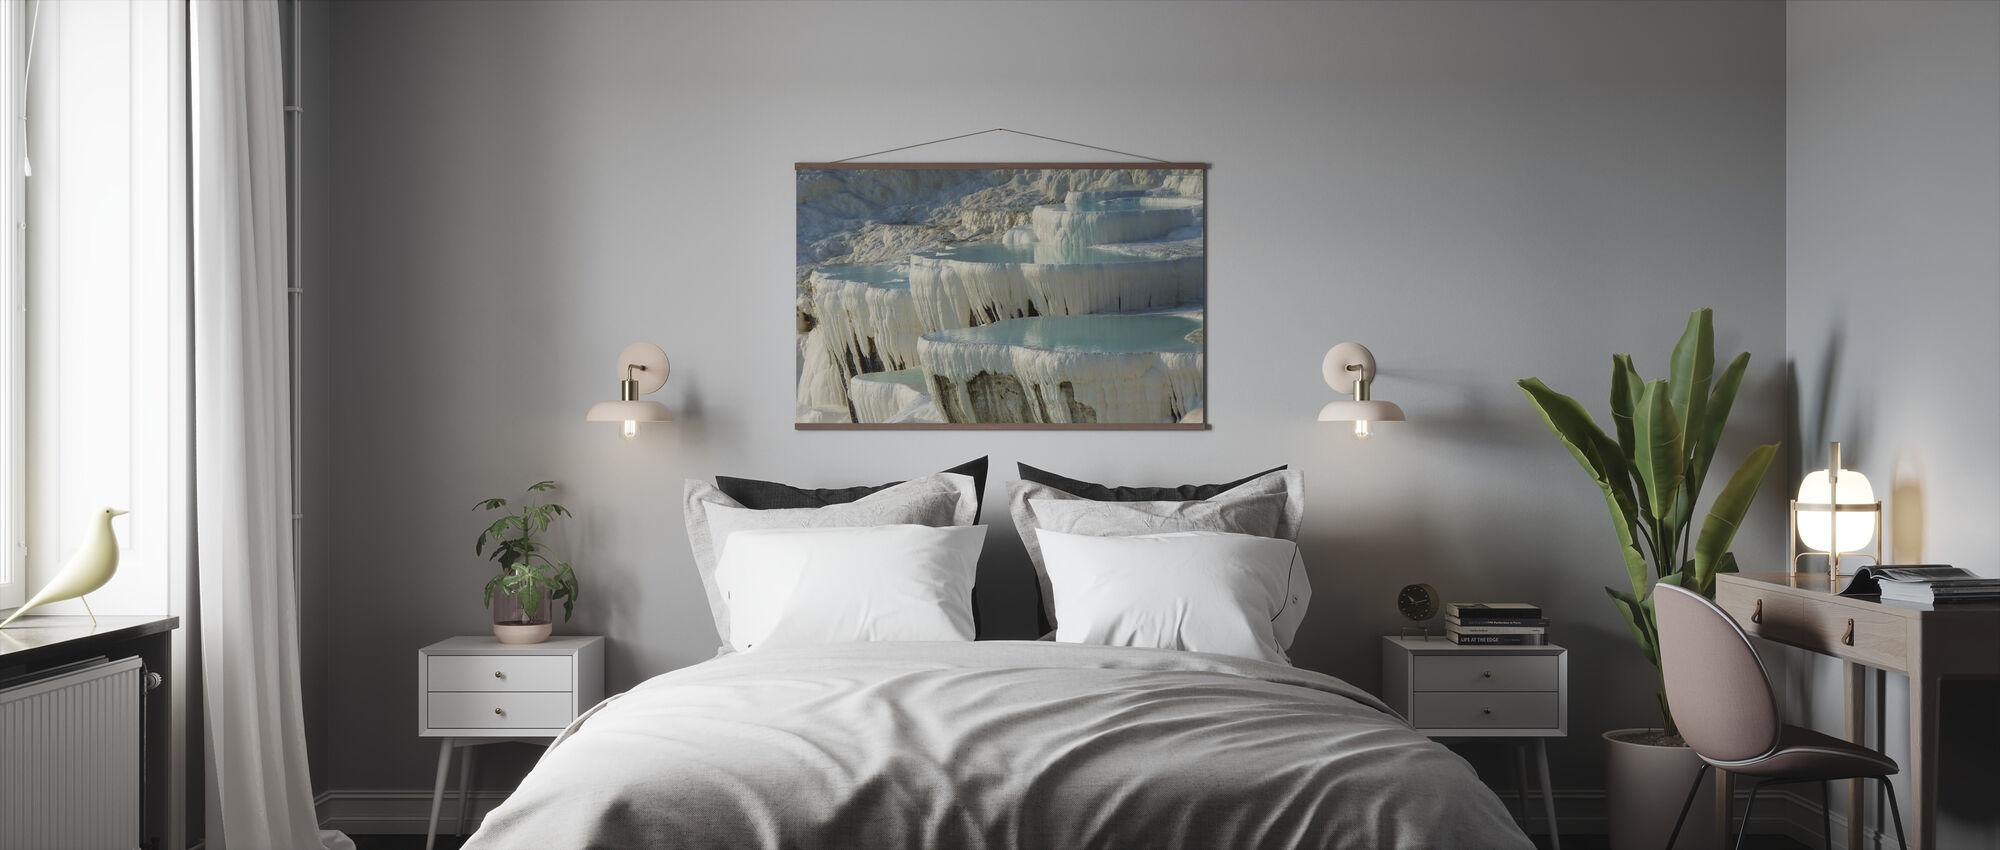 Pamukkale Speleothems - Poster - Bedroom